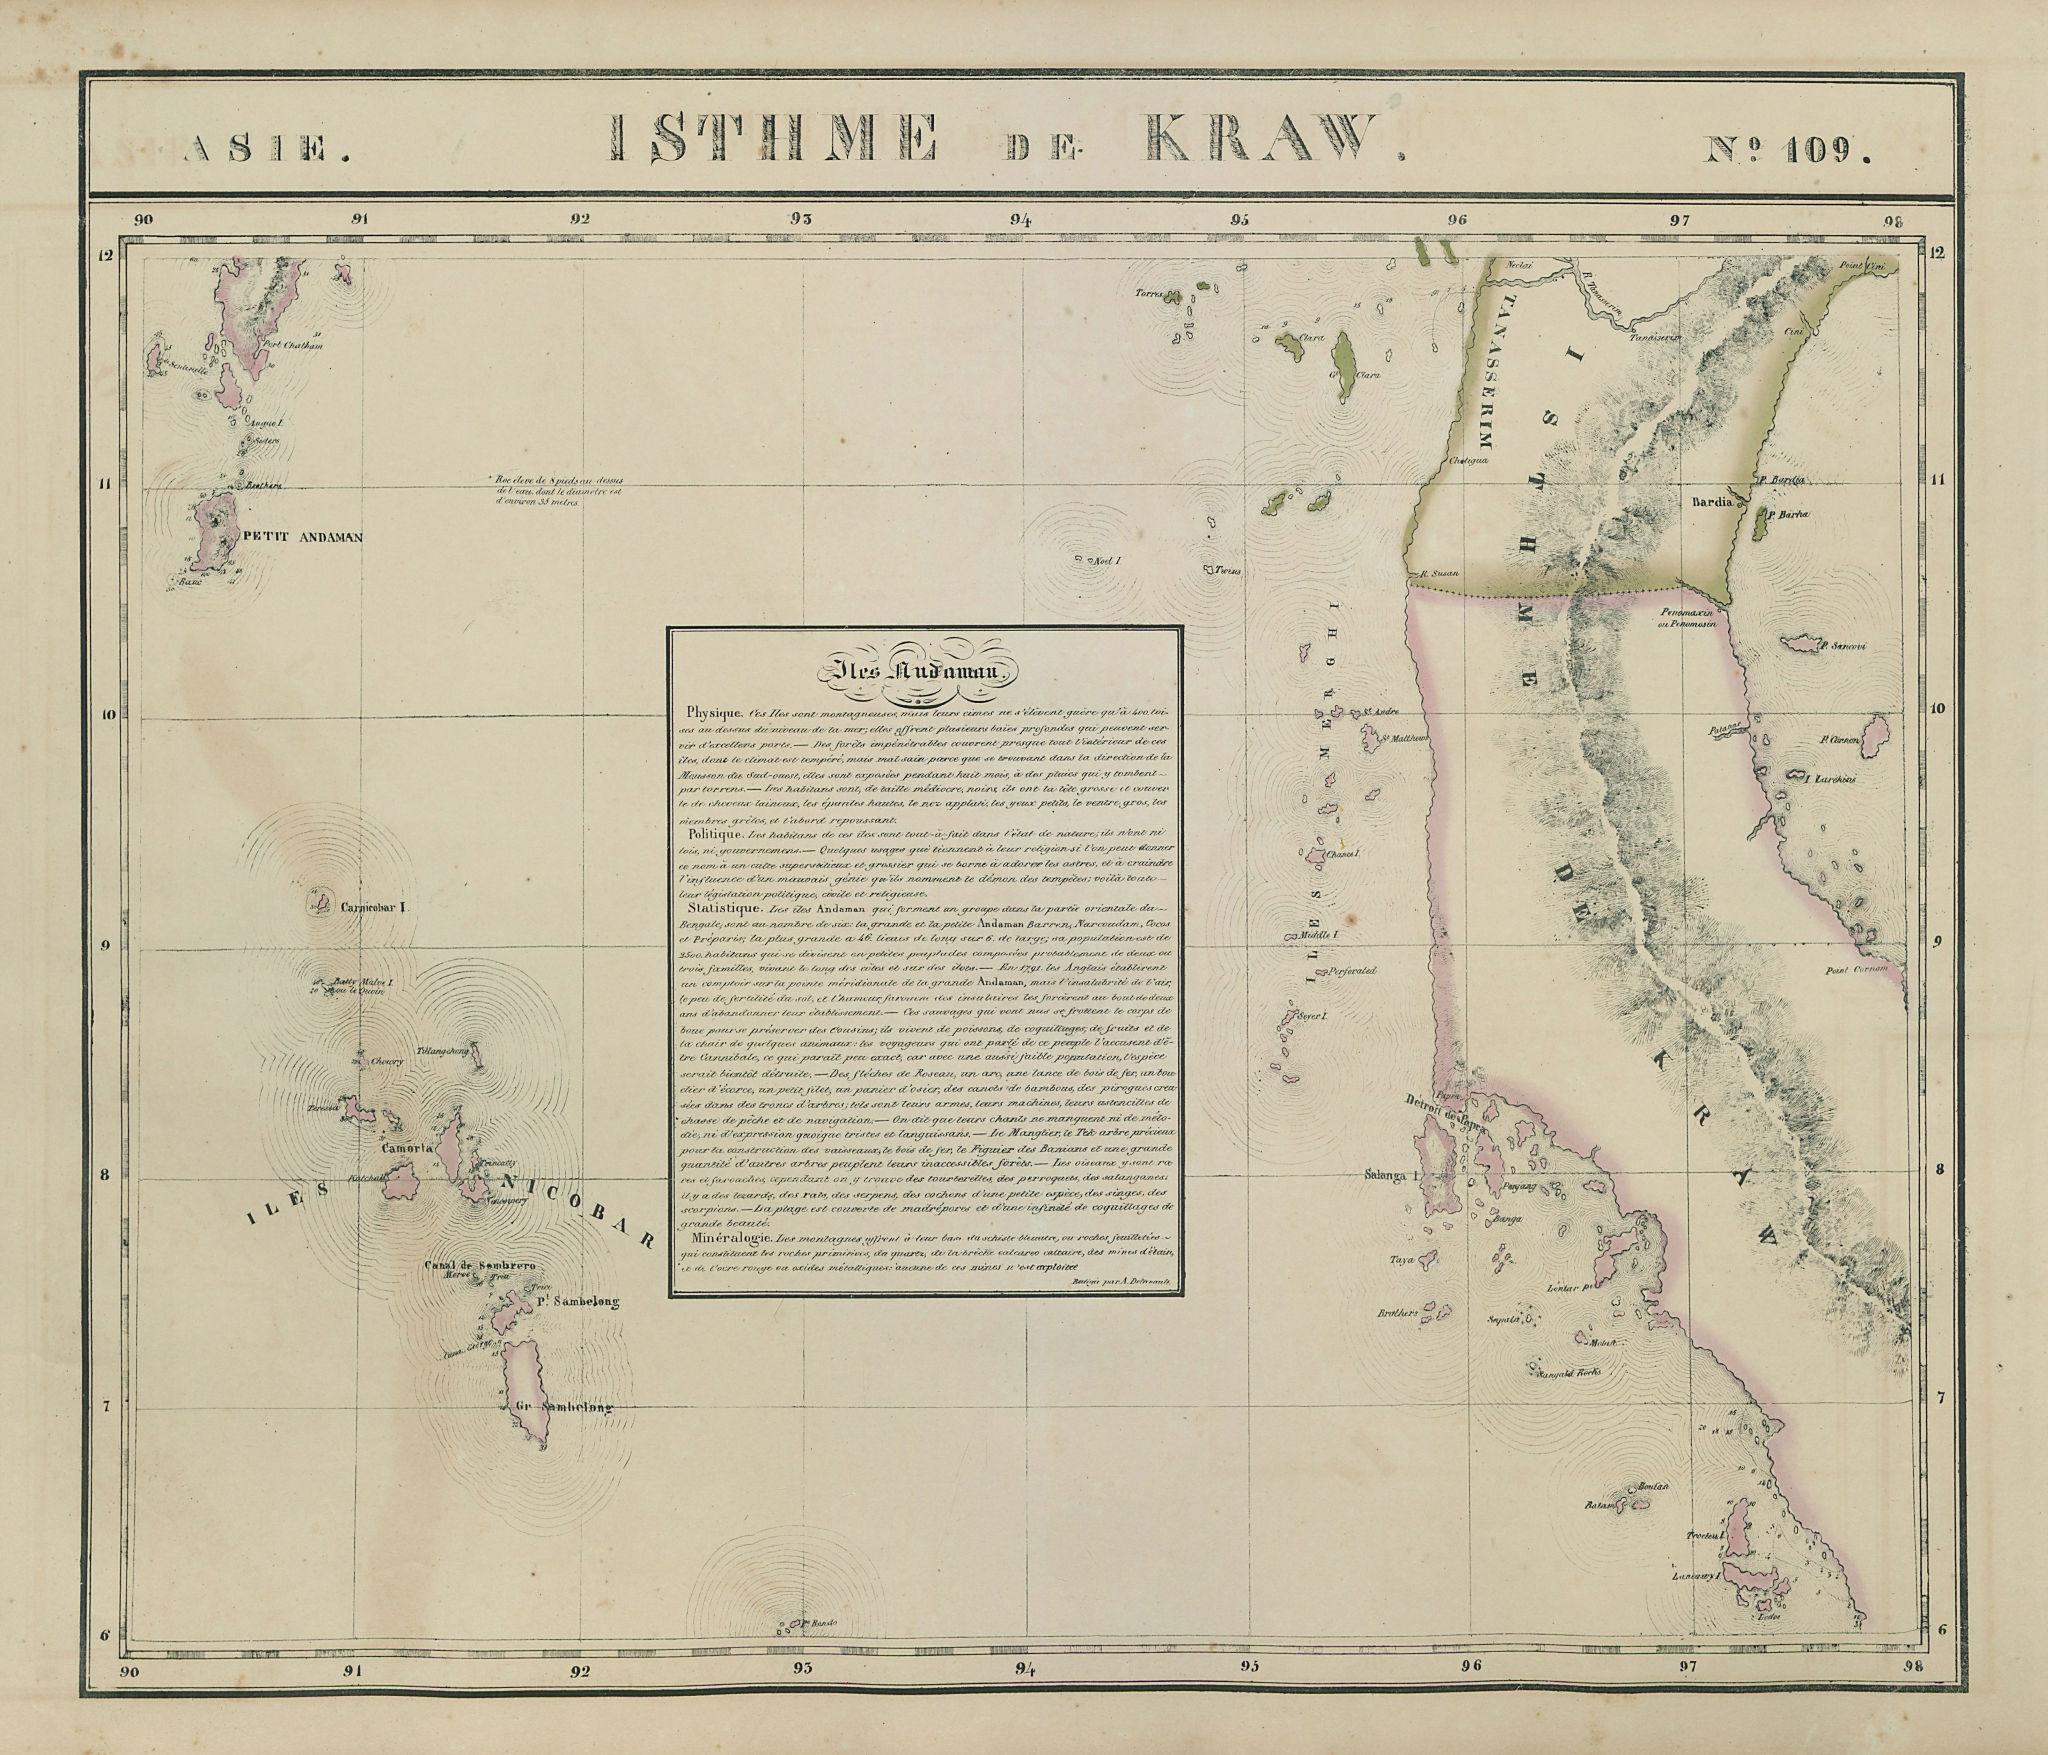 Asie. Isthme de Kraw #109 Thailand Phuket Burma Nicobar VANDERMAELEN 1827 map